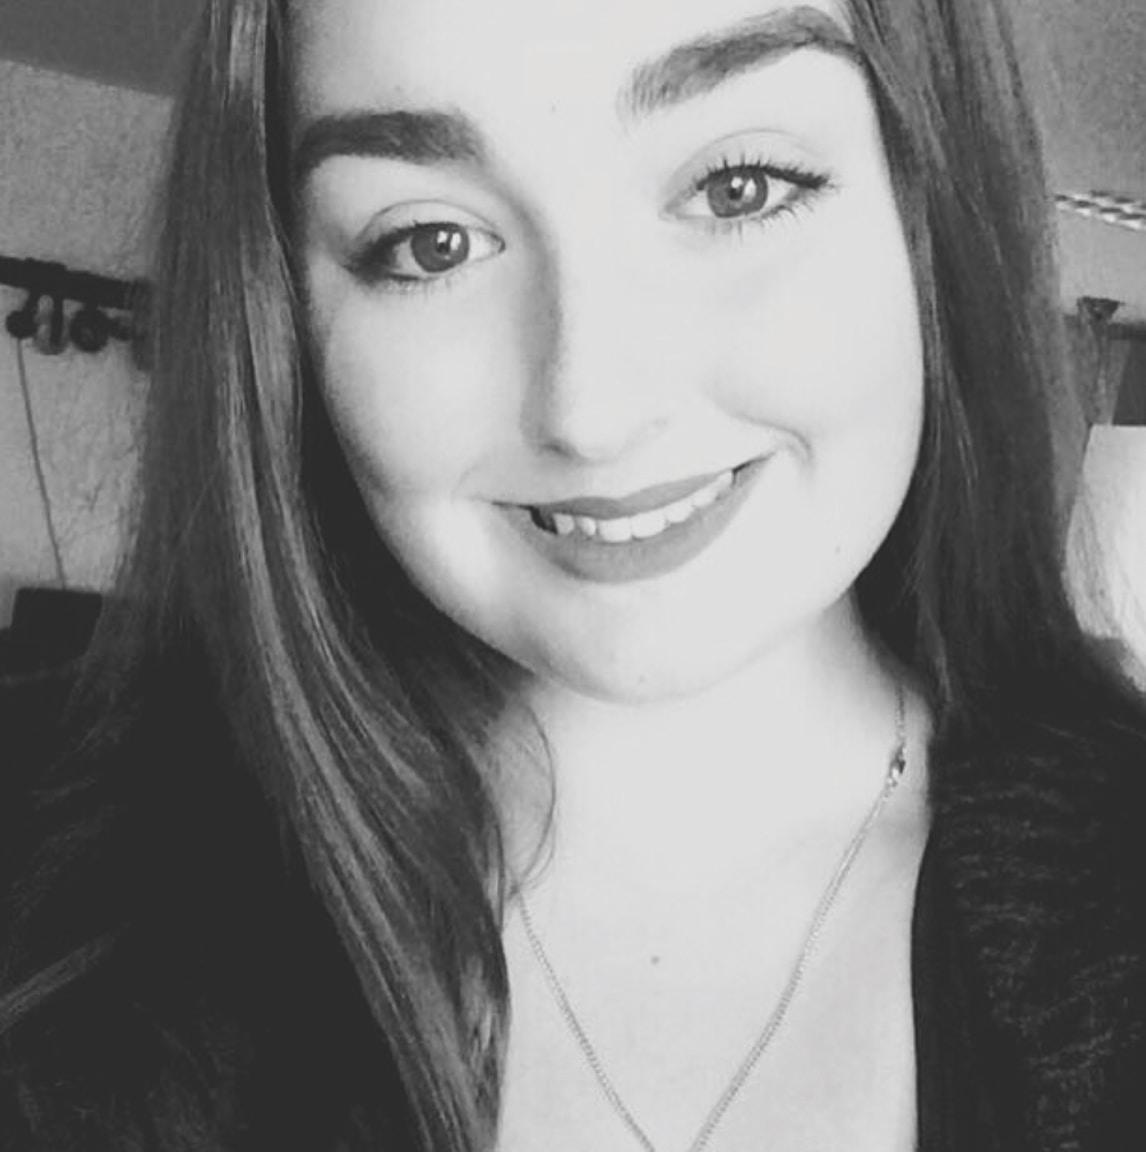 Go to Jolinde Aaltink's profile